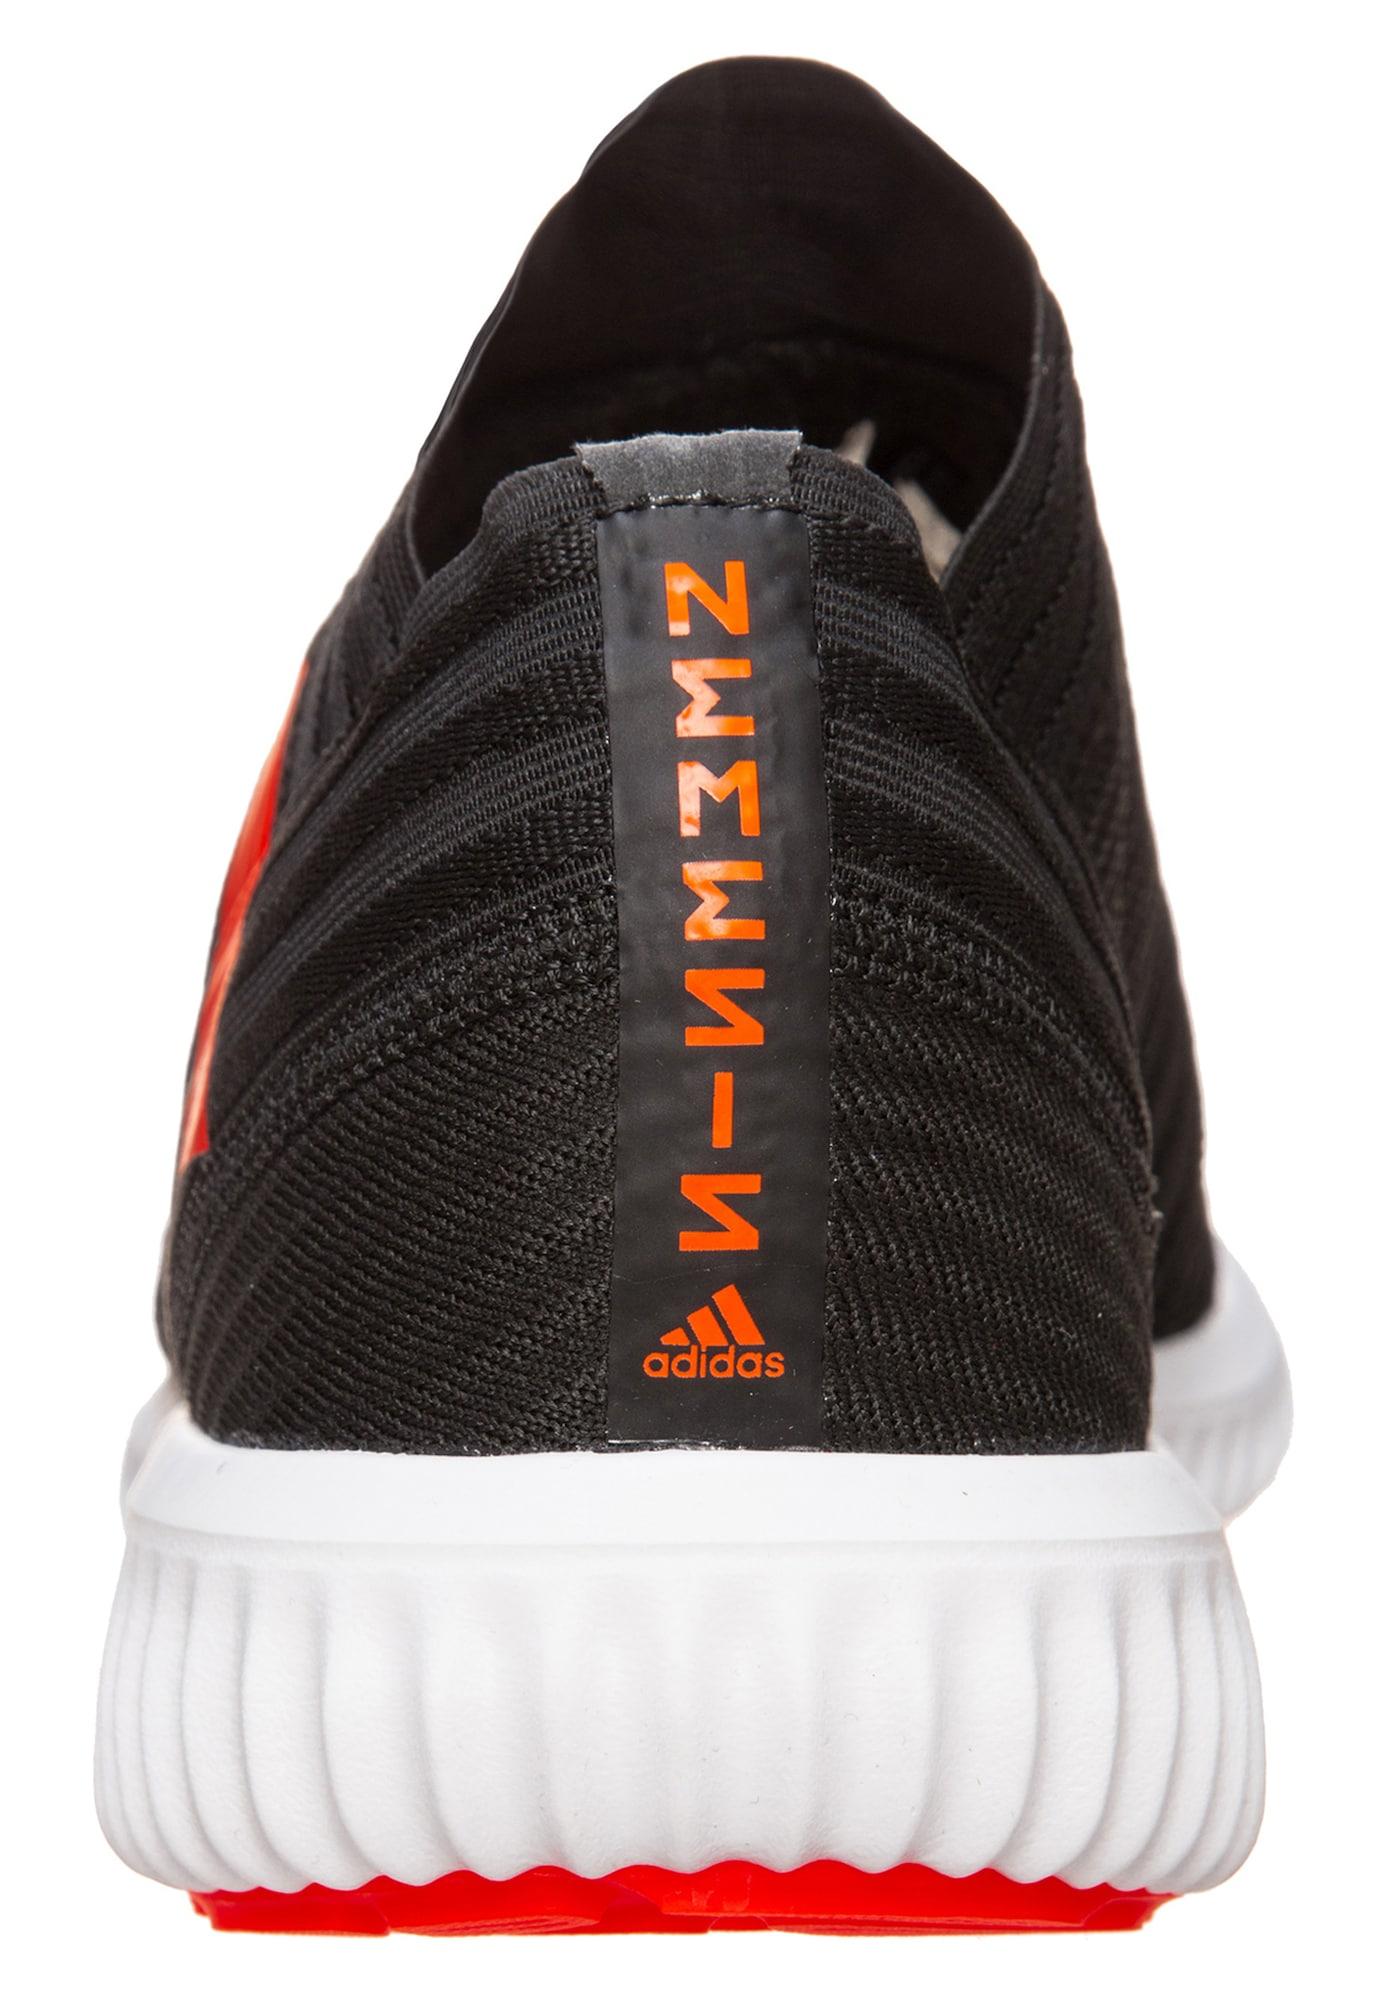 best sneakers 9abce 824f6 AboutYou  SALE Herren ADIDAS PERFORMANCE Fußballschuh Nemeziz-tango 17.1  Trainers Street grau, orange, rot, schwarz   Schuhonlinemarkt.de